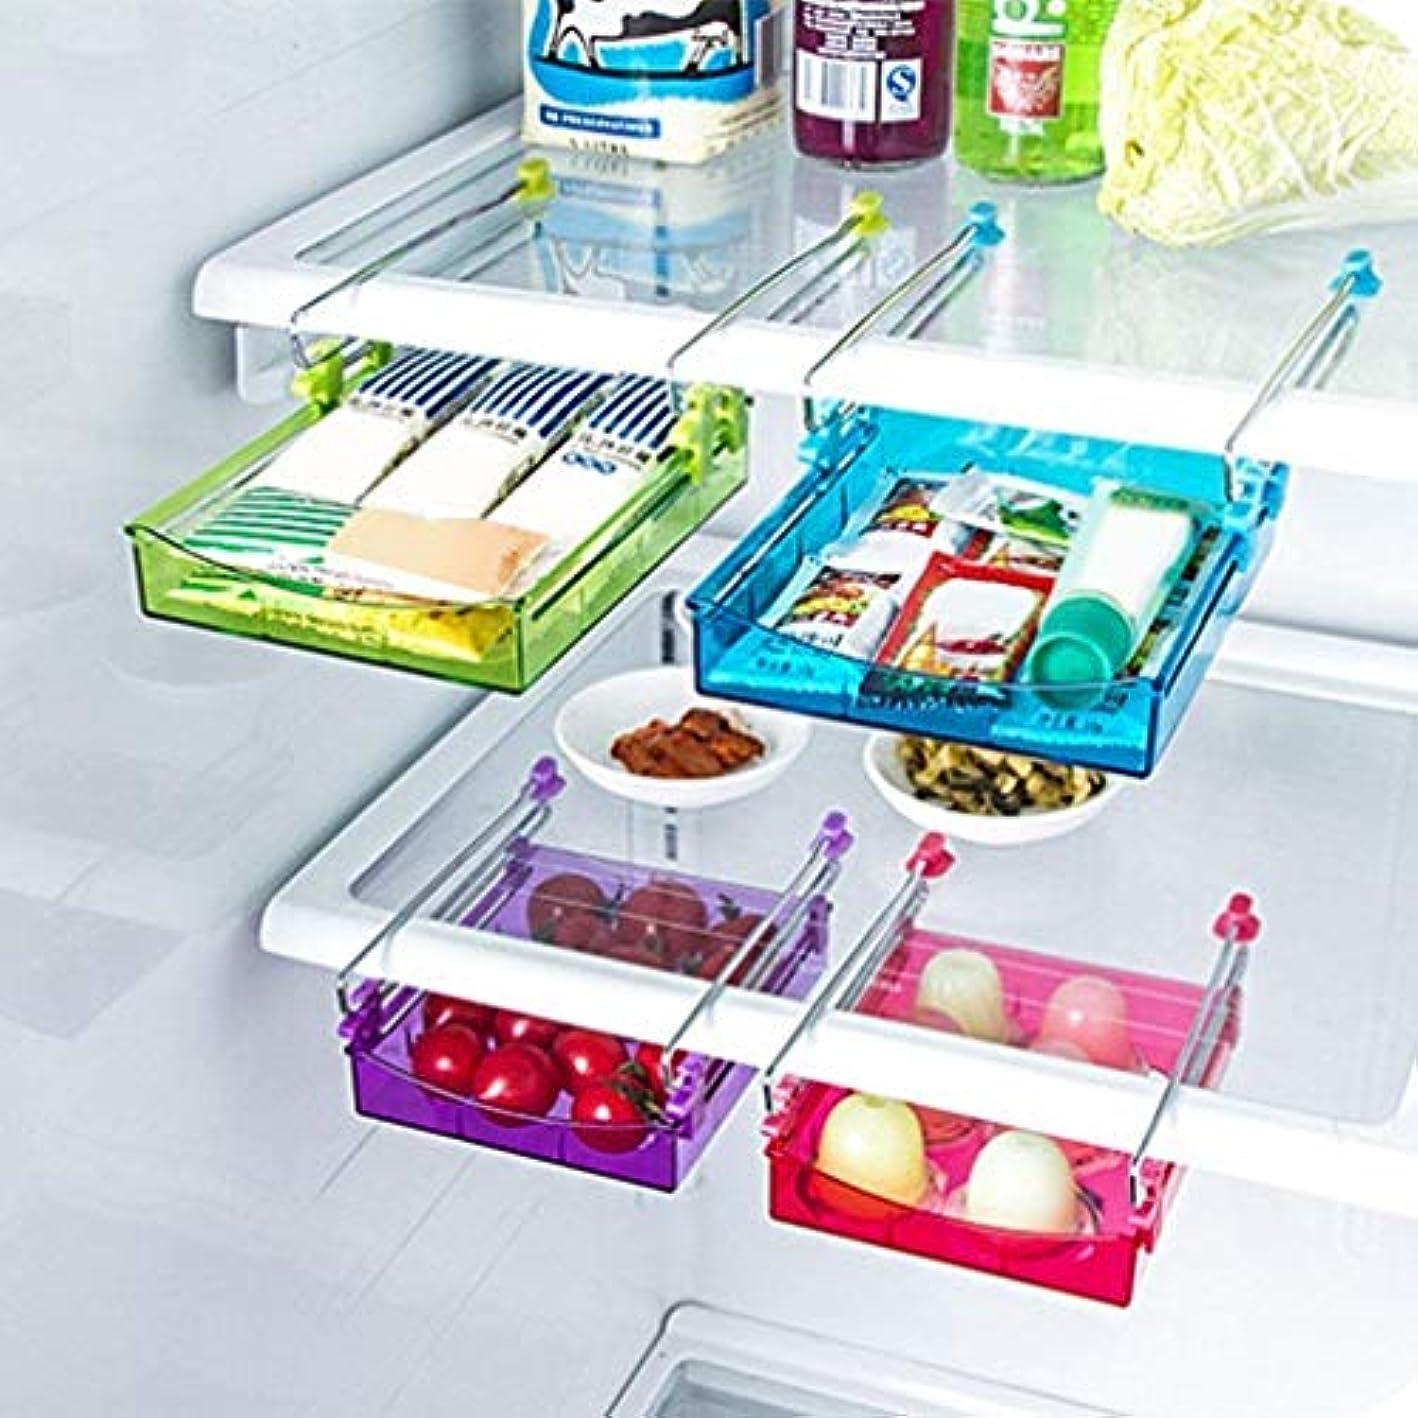 Kikole Home Kitchen Refrigerator Keep Fresh Sliding Drawer Storage Box Food Storage & Organization Sets